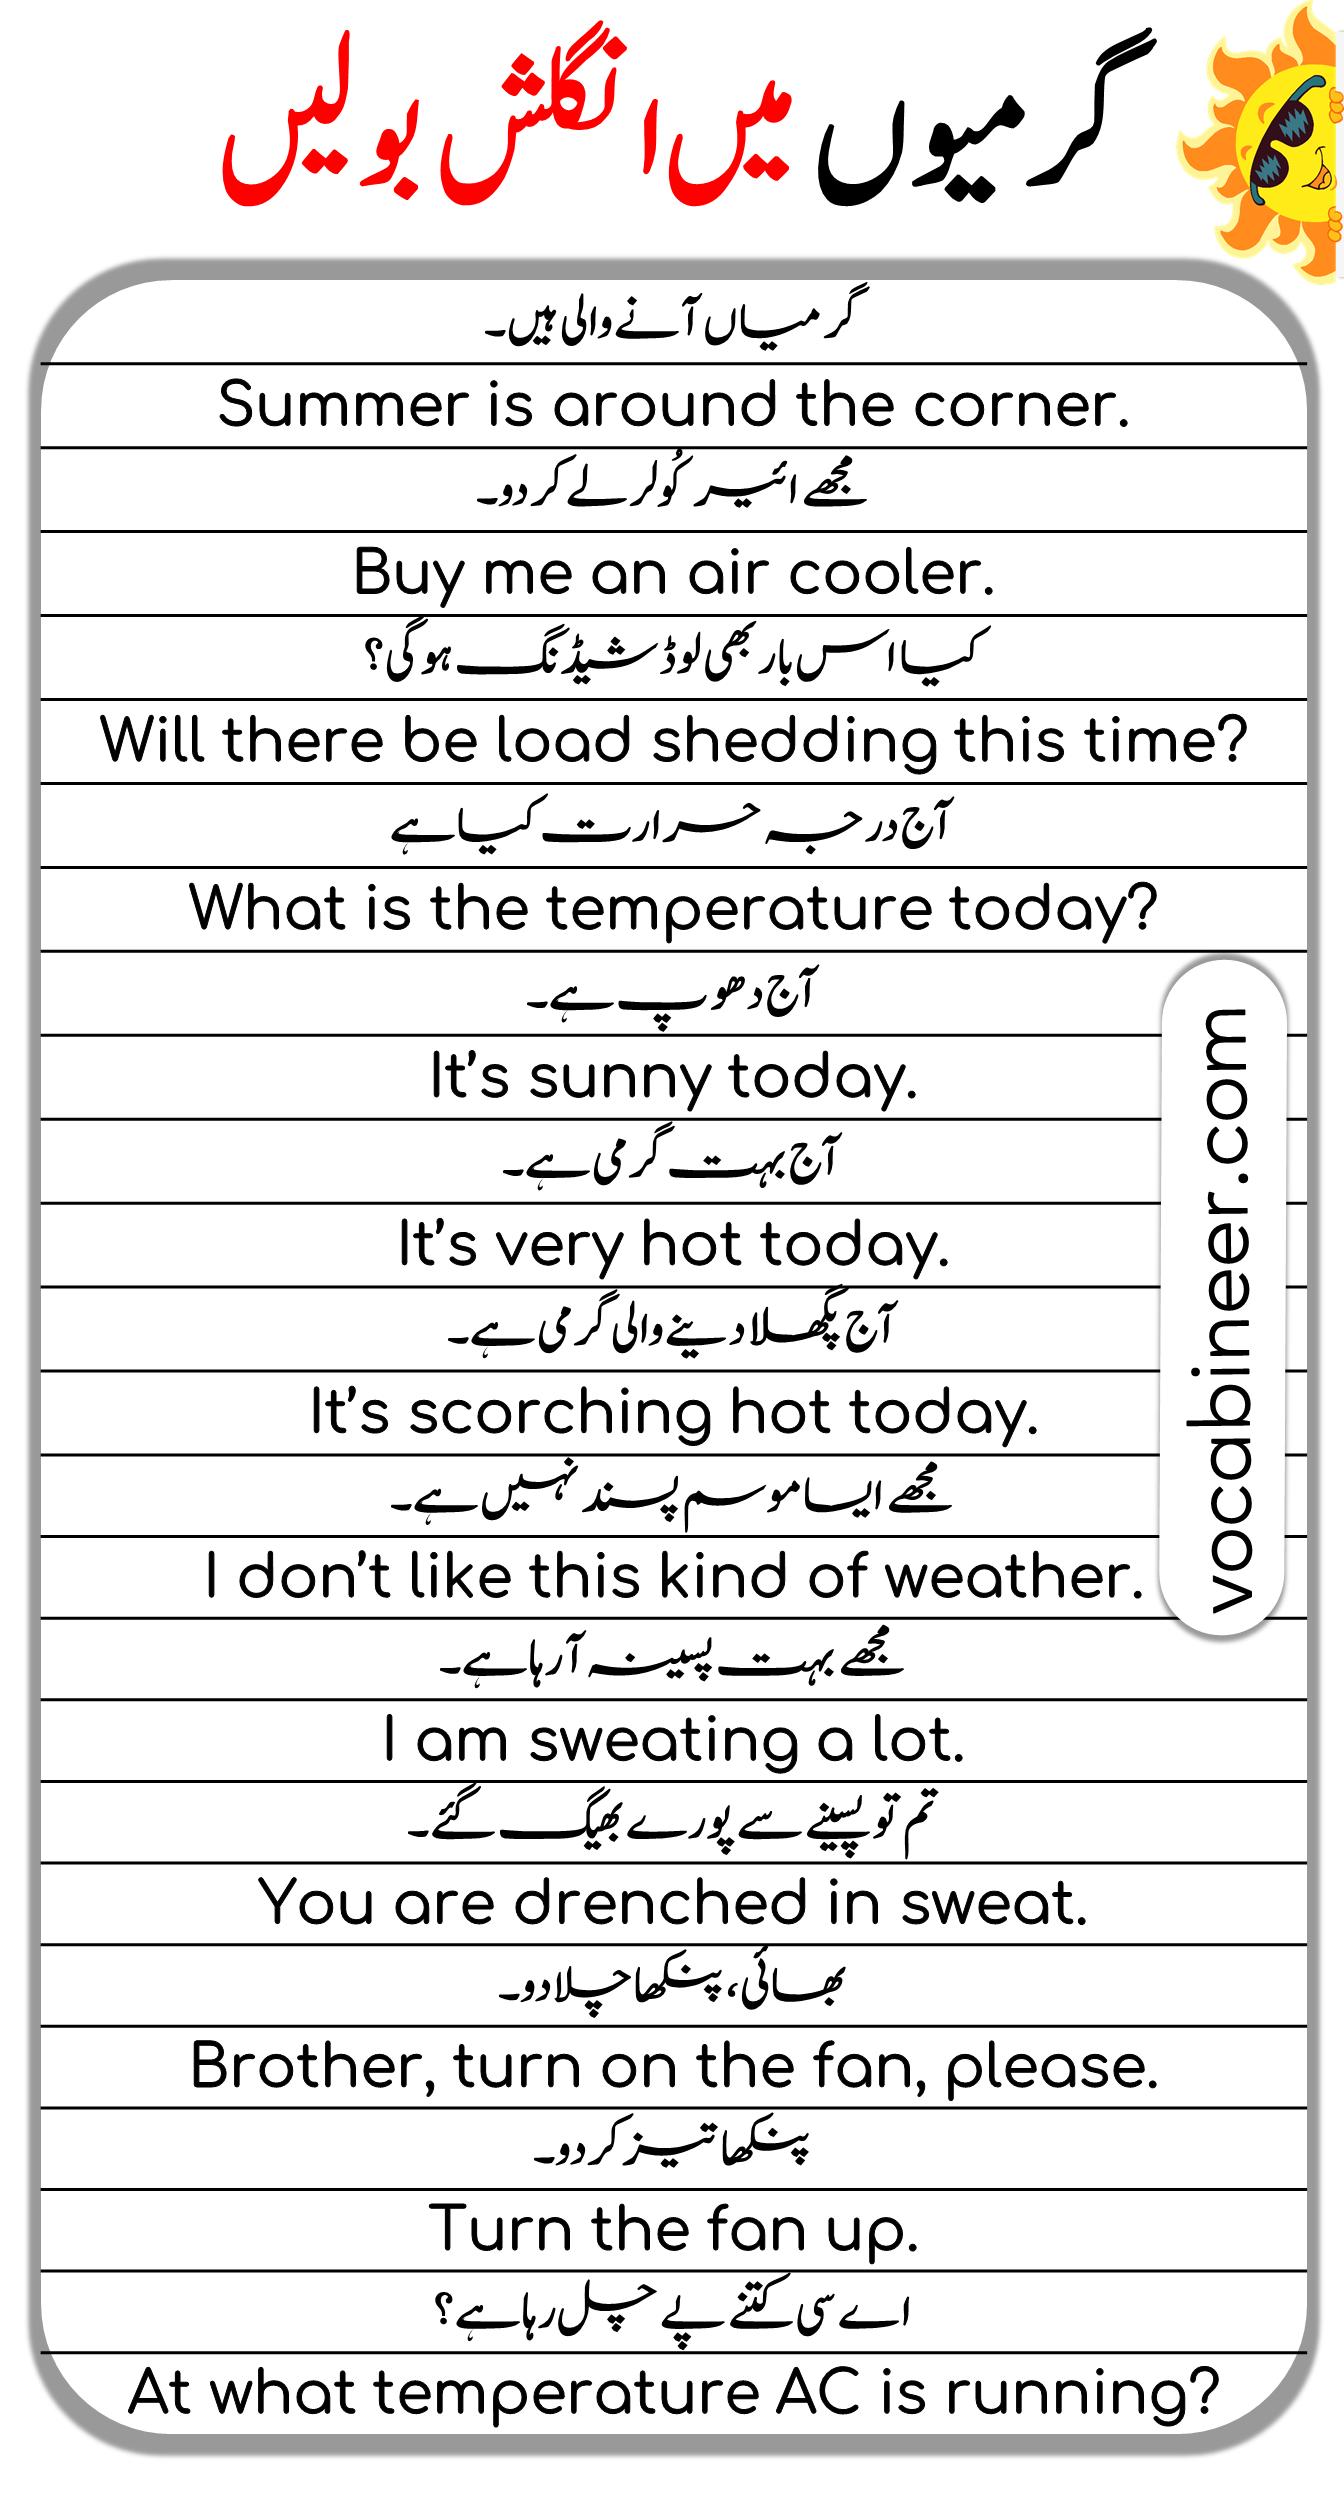 Vocabineer English Sentences for Summer